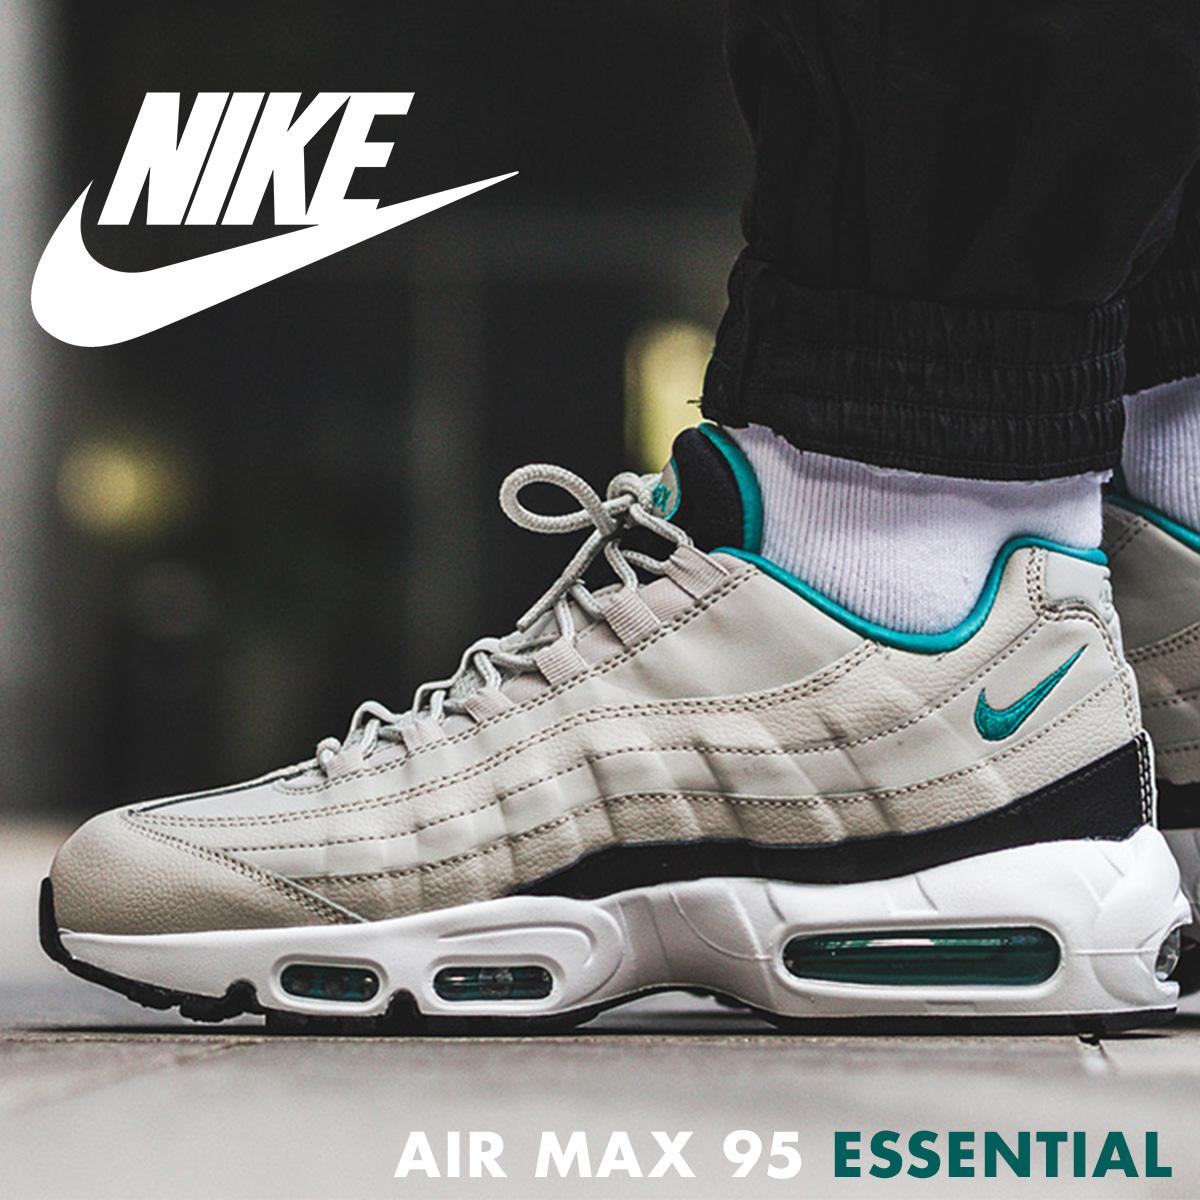 Nike Air Max 95 Essential   White   Sneakers   749766 027